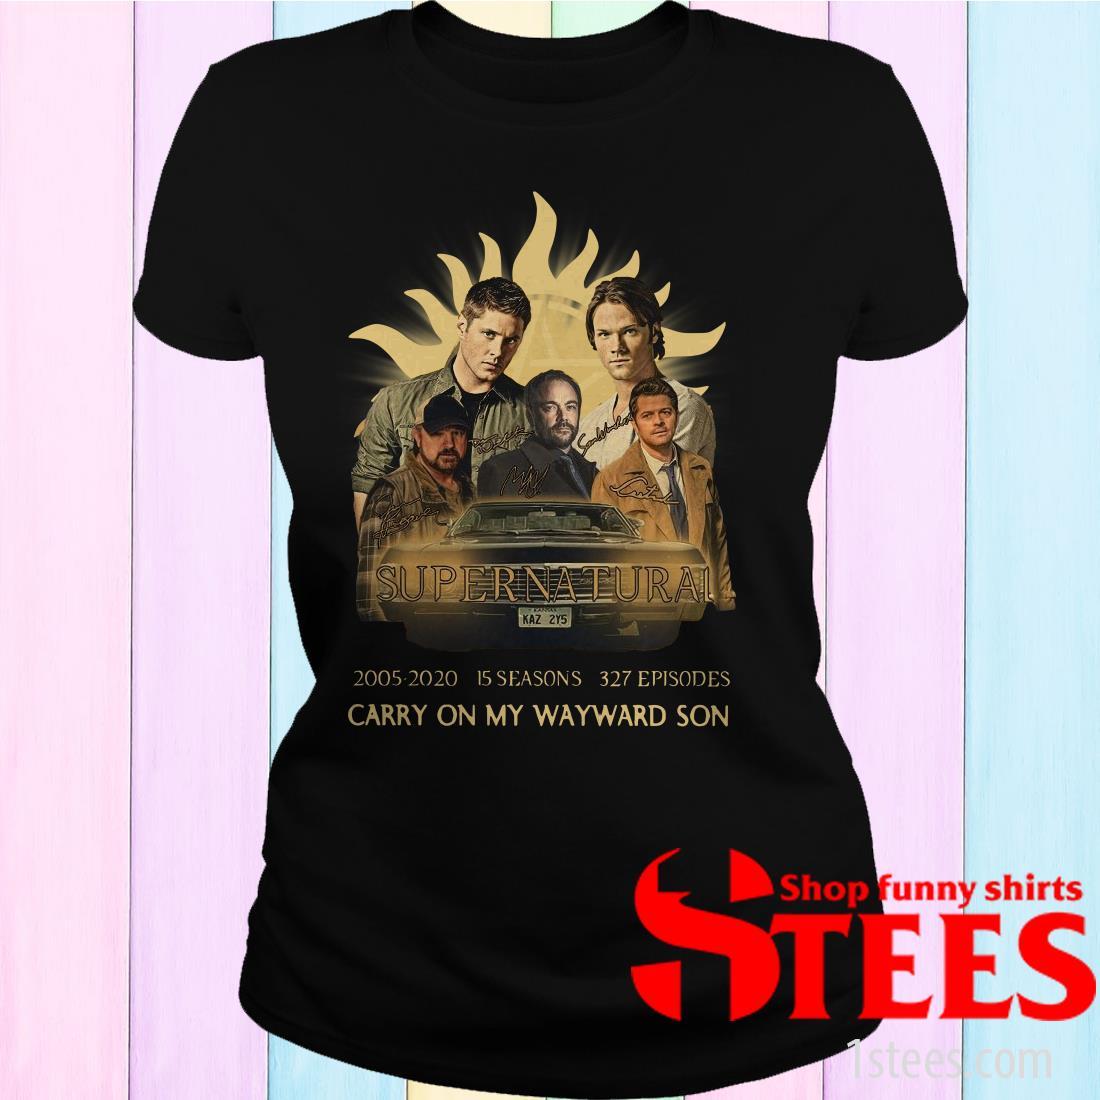 Supernatural 2005-2020 15 Seasons 327 Episodes Carry On My Wayward Son Women's T-Shirt